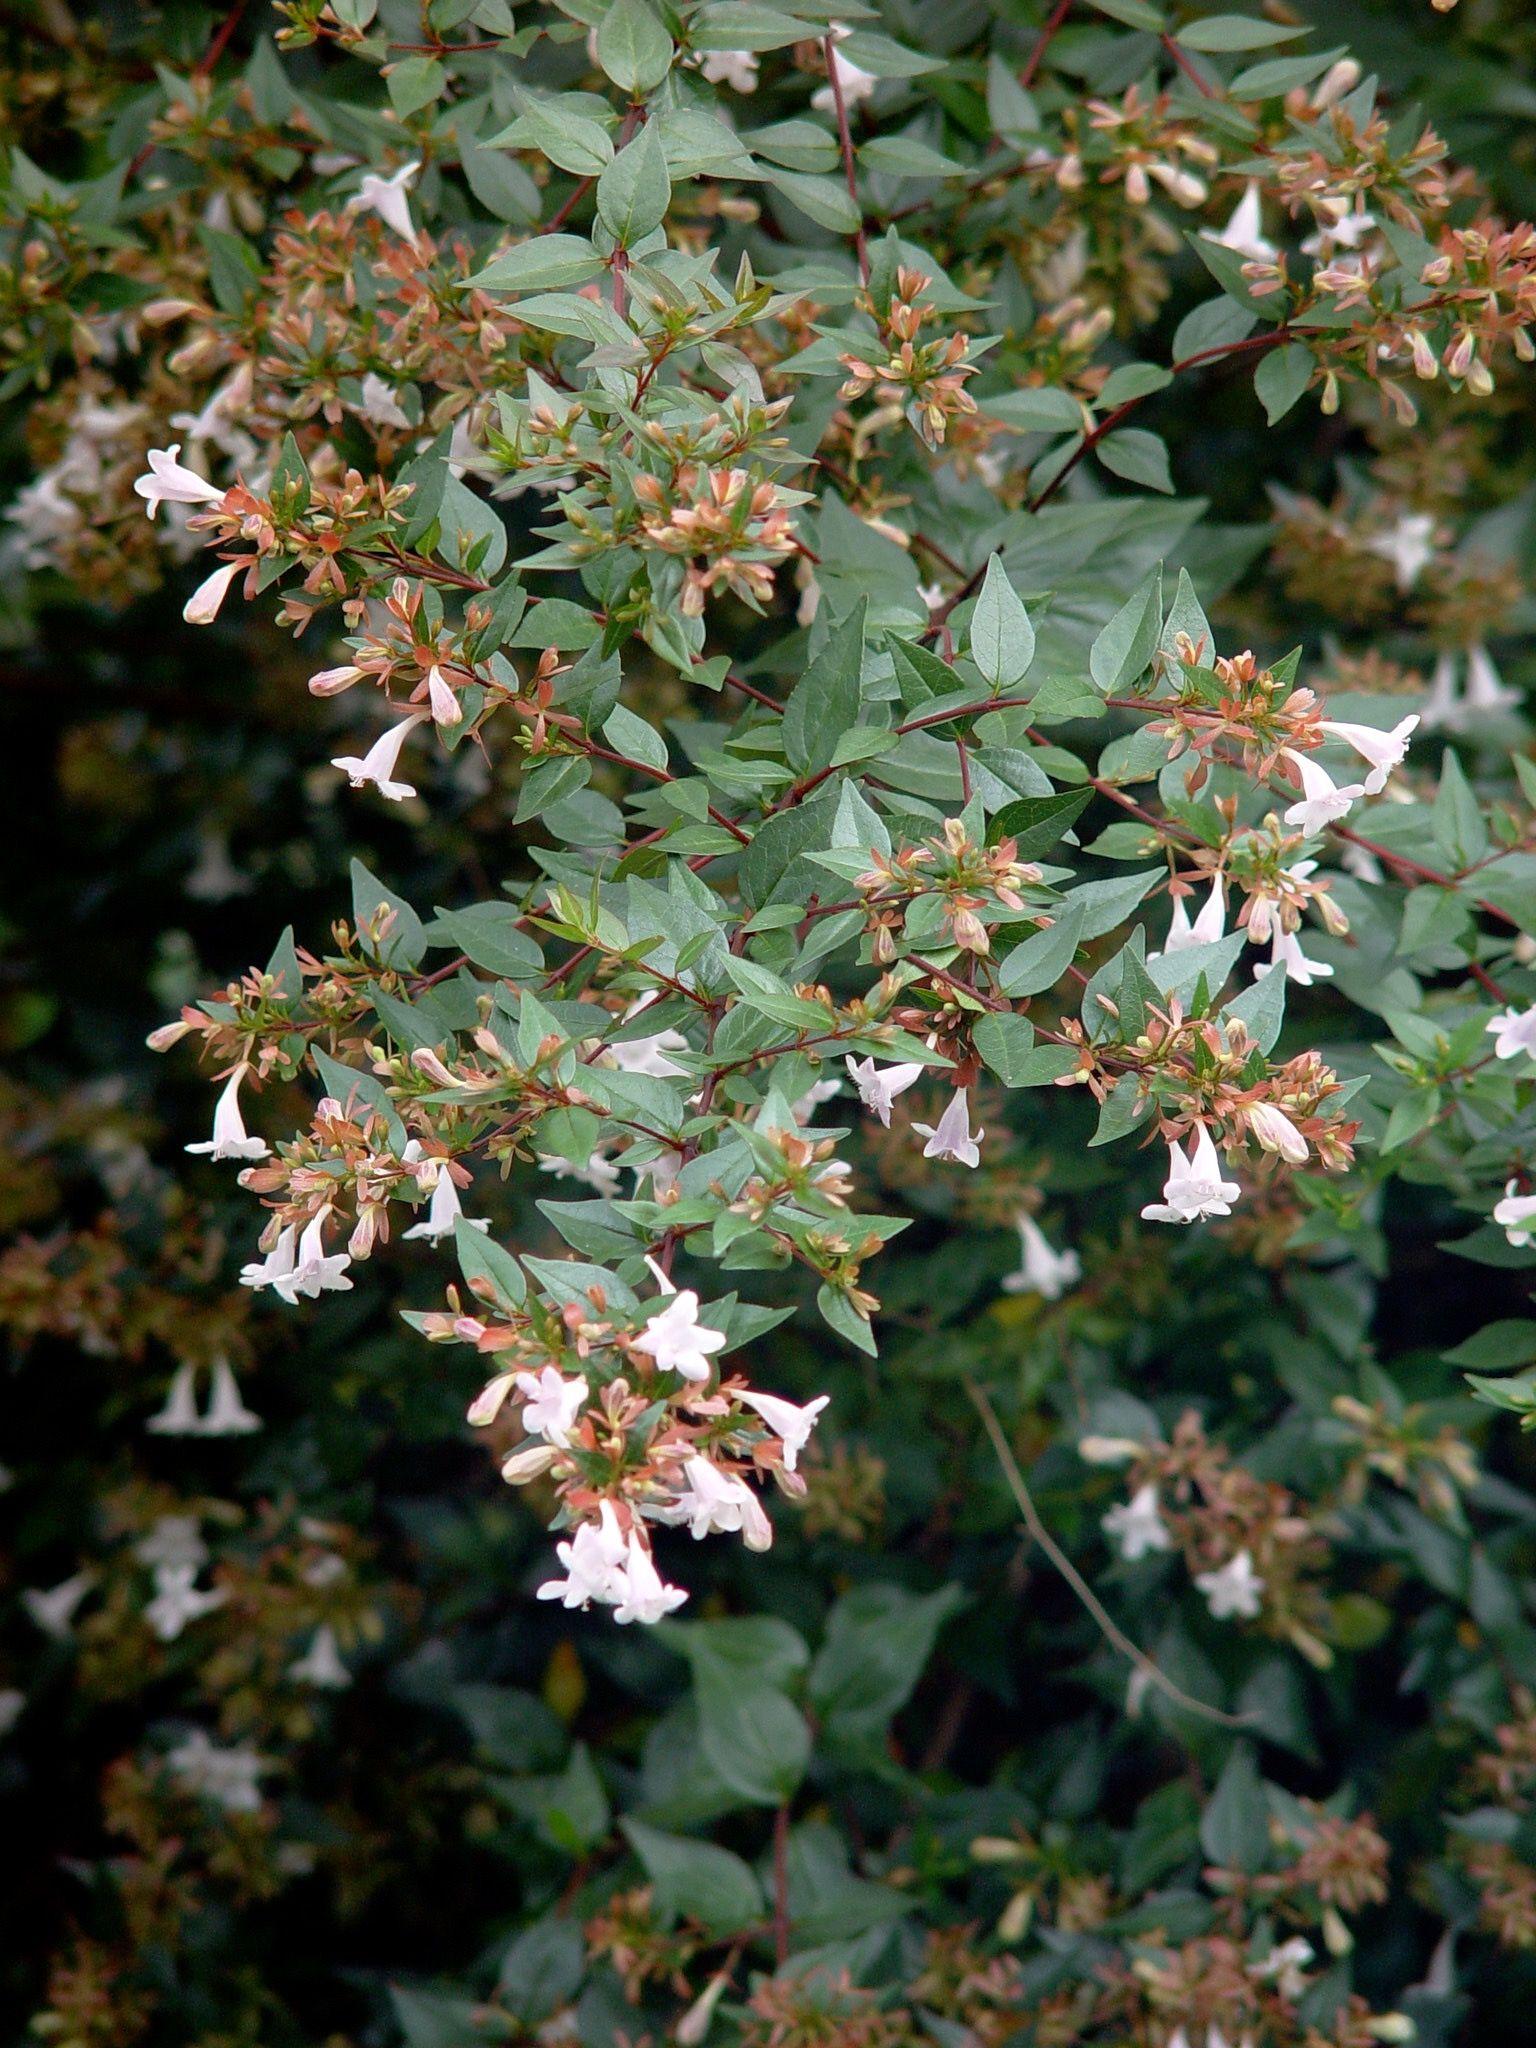 Abelia Grandiflora Lovely Arching Shrub Delicate White Flowers